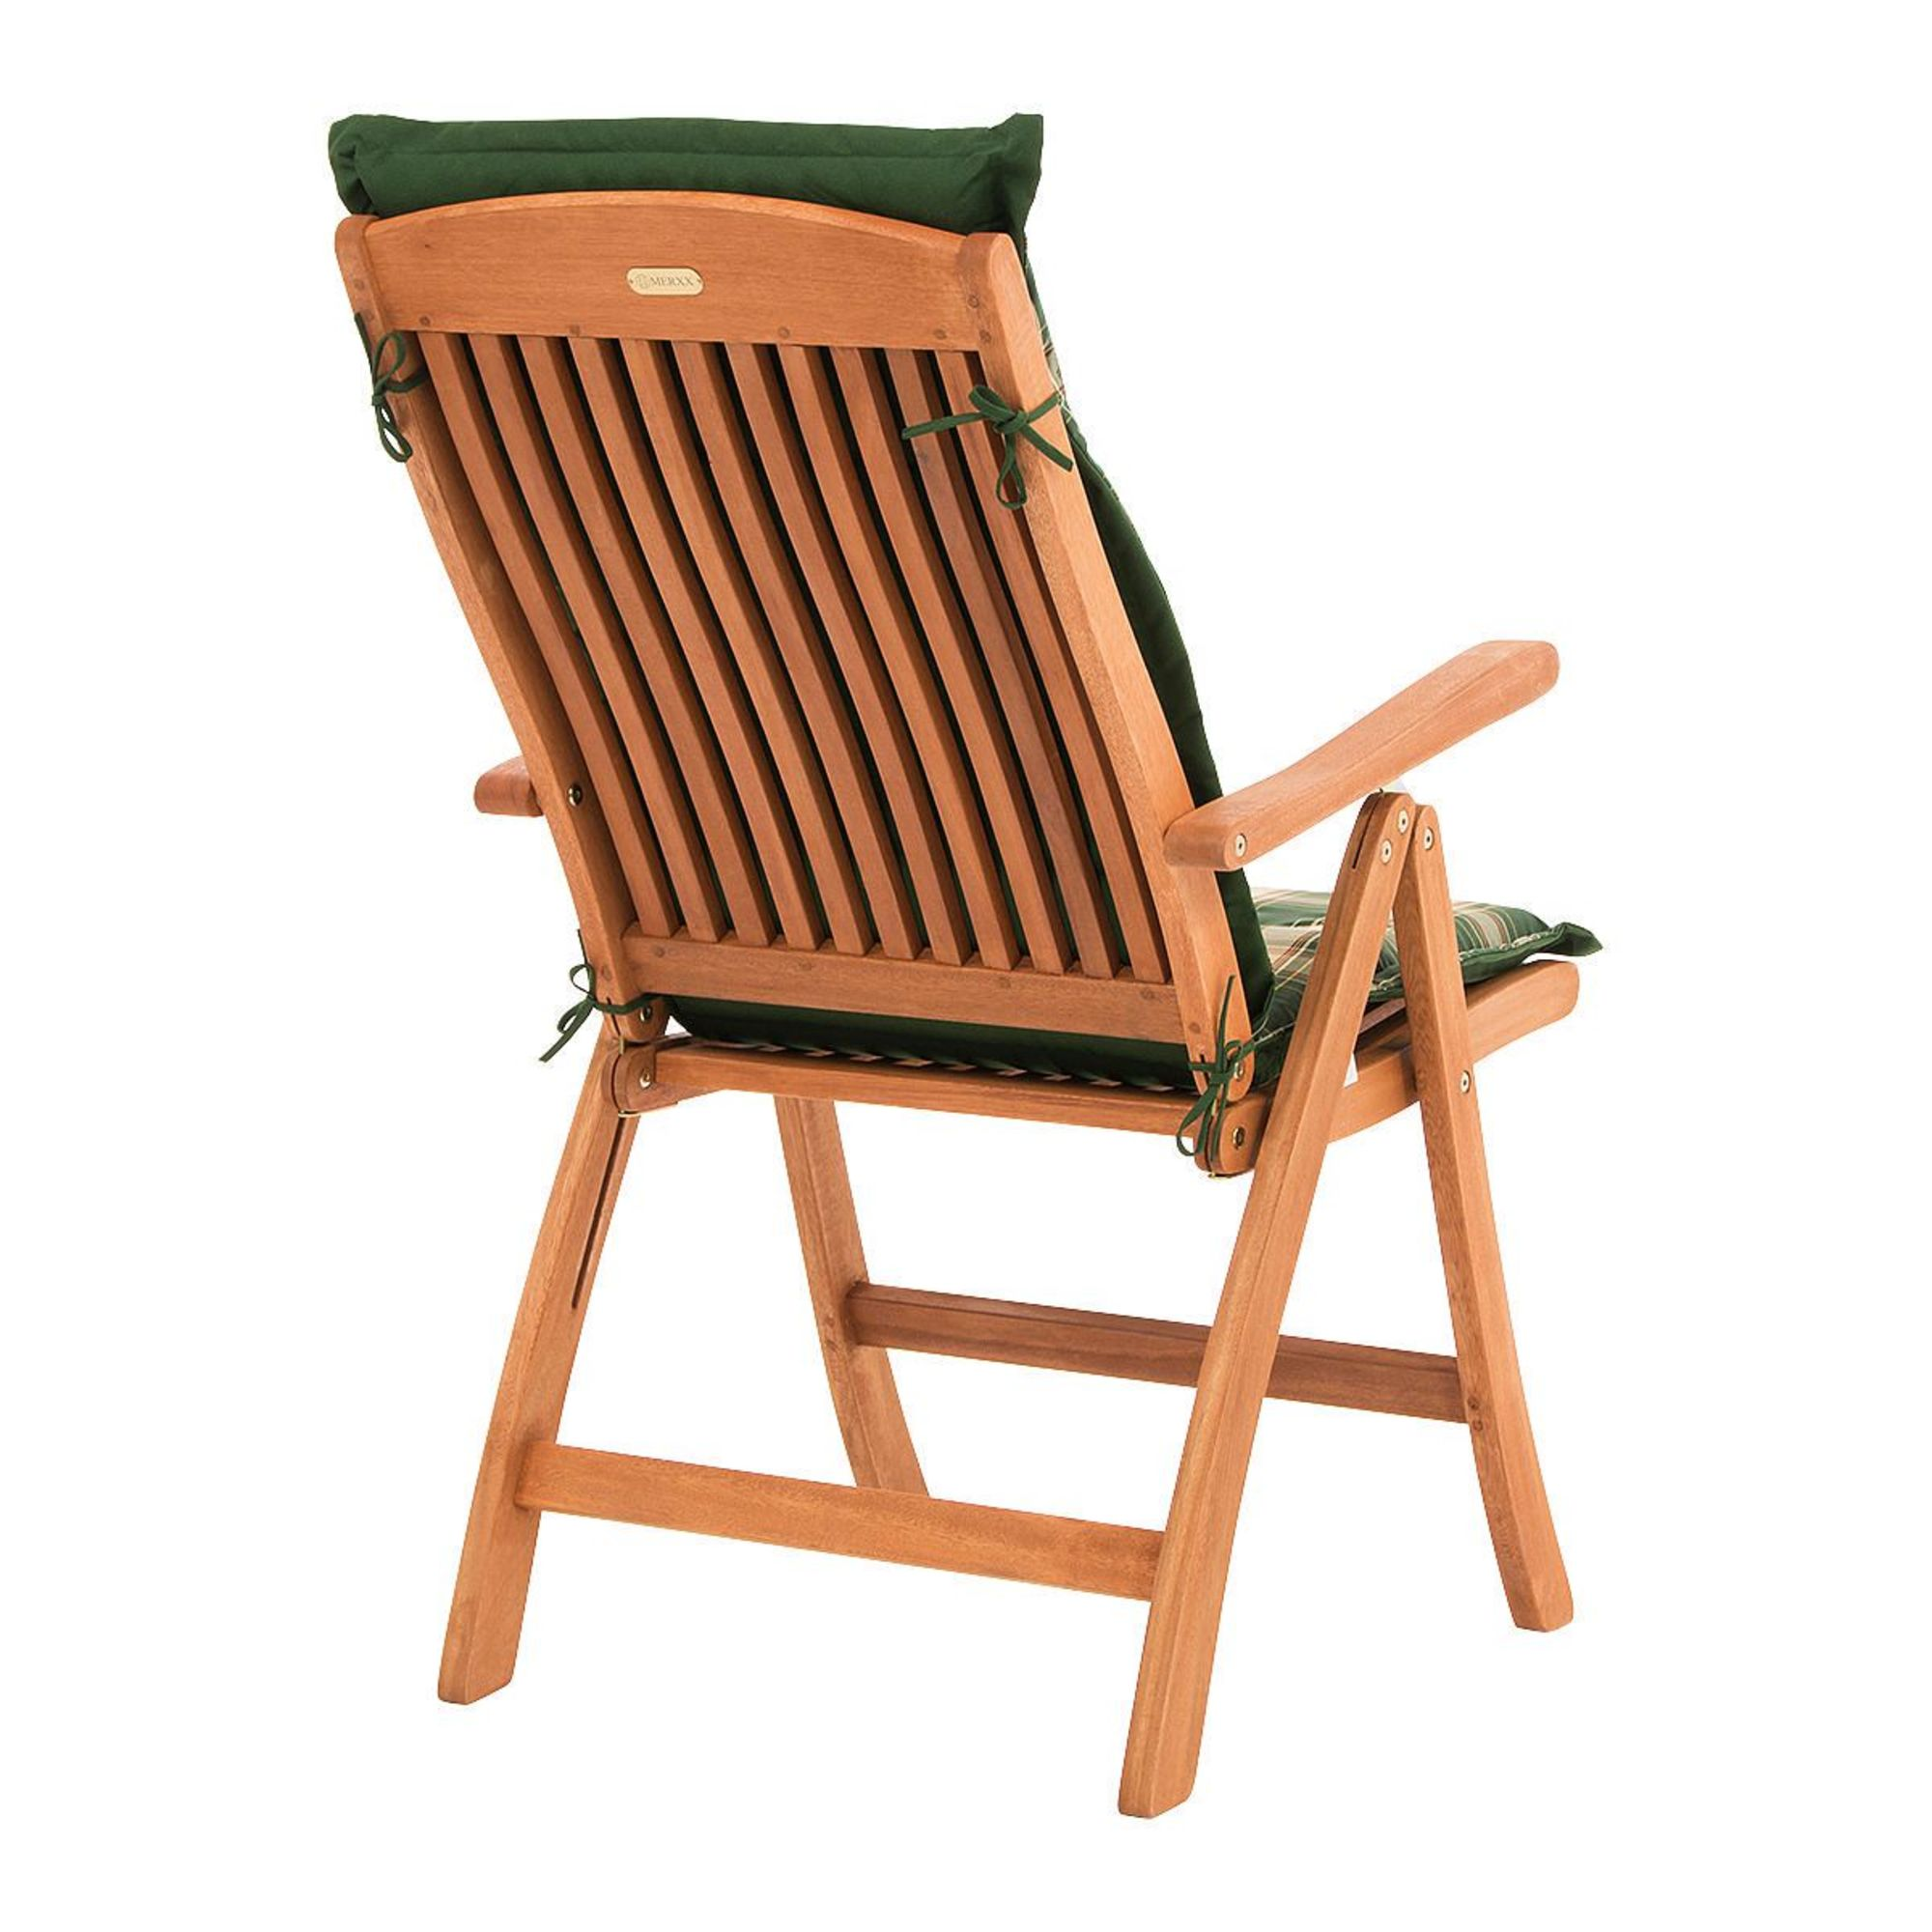 Gartenstühle holz  Gartenstühle Holz | saigonford.info